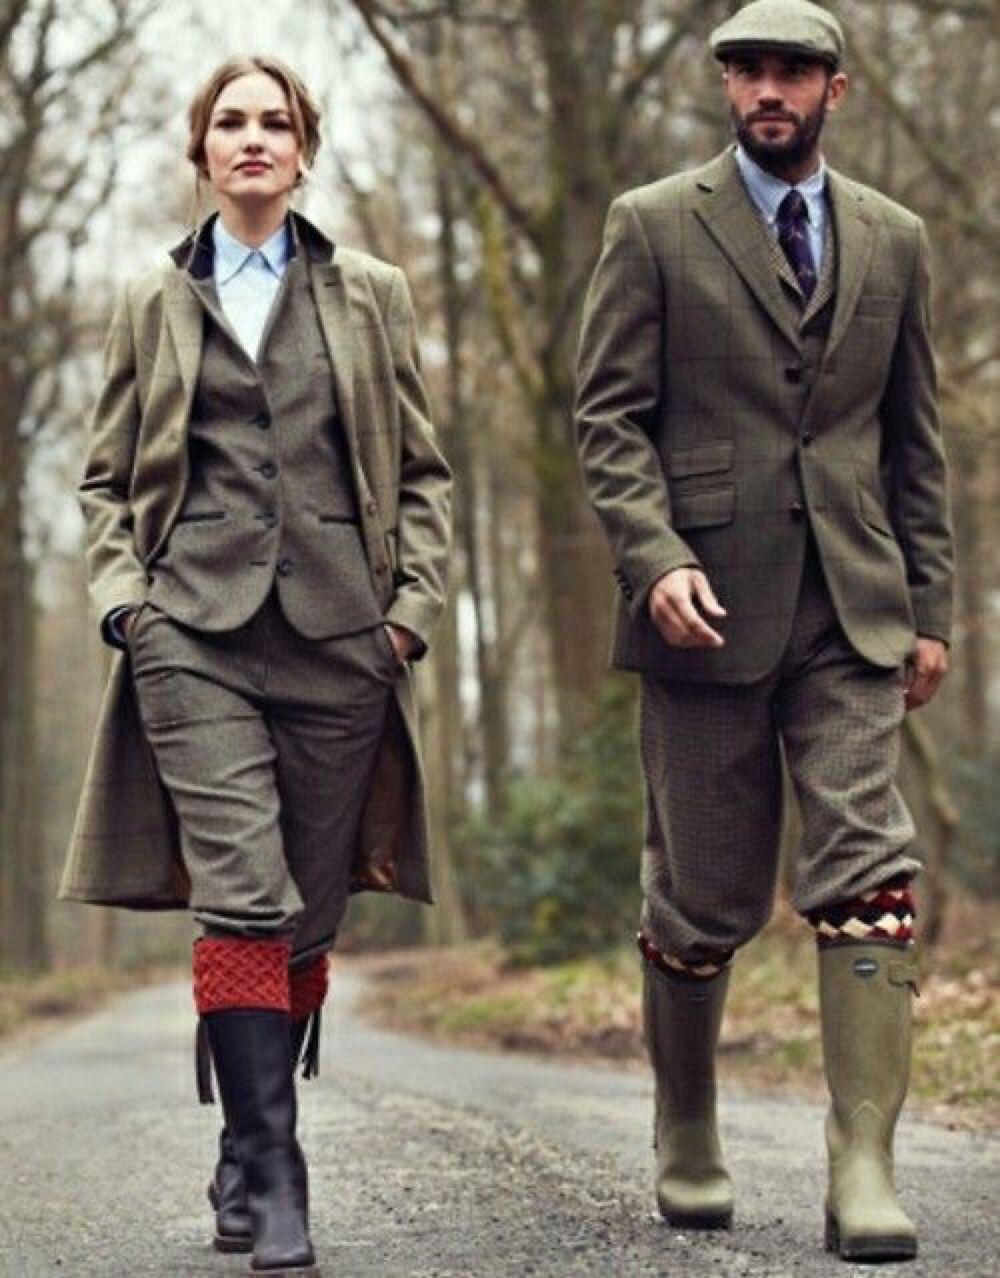 Sidelocksfoxhounds rwc androgyny pinterest fashion country